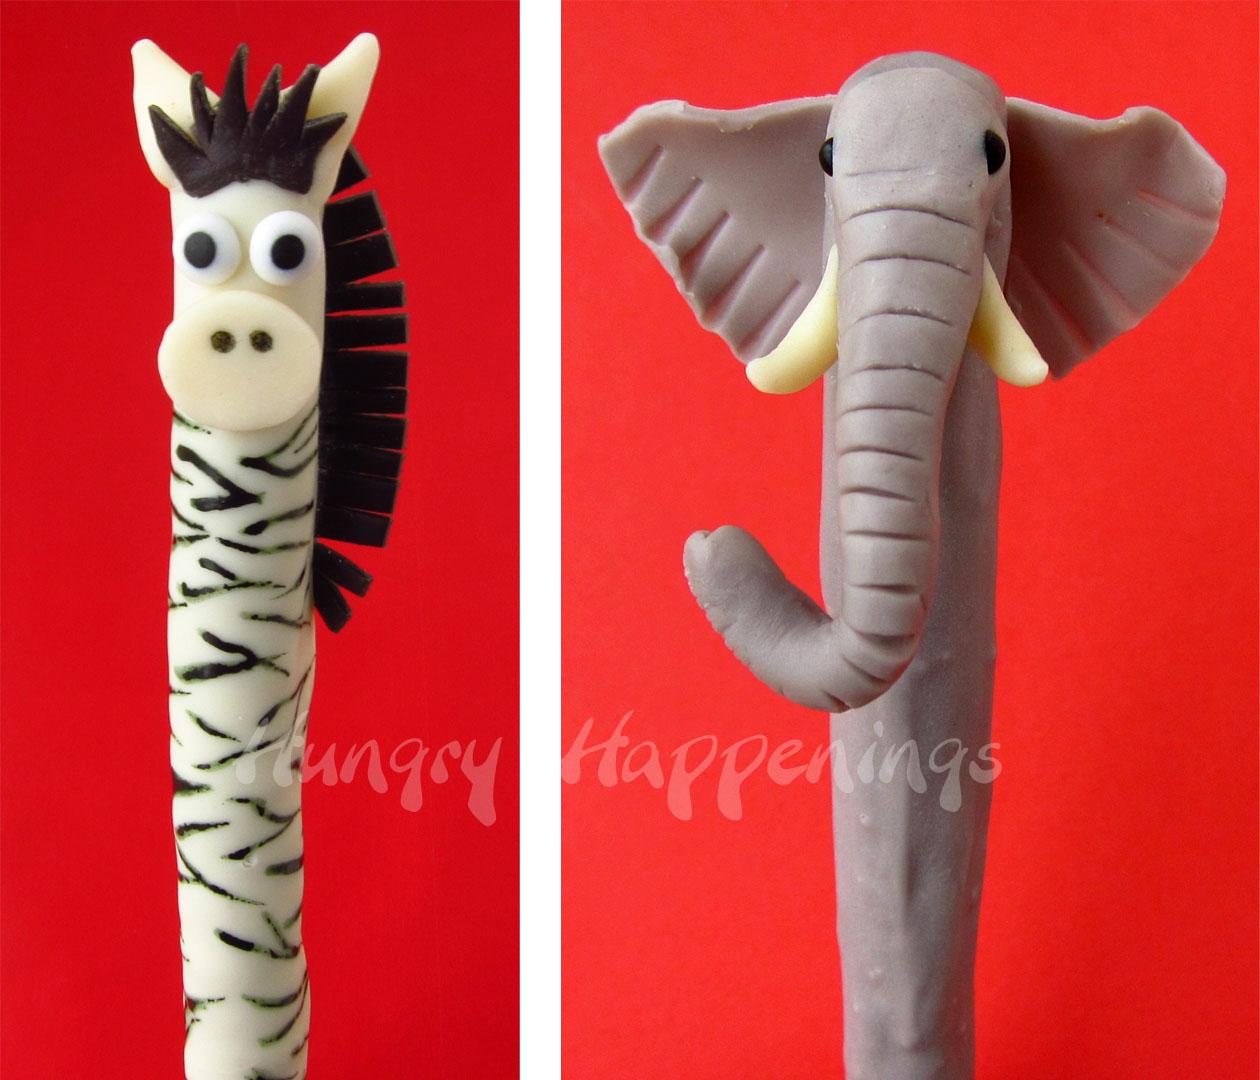 Jungle Animal Pretzel Pops - Fun and Tasty Treats